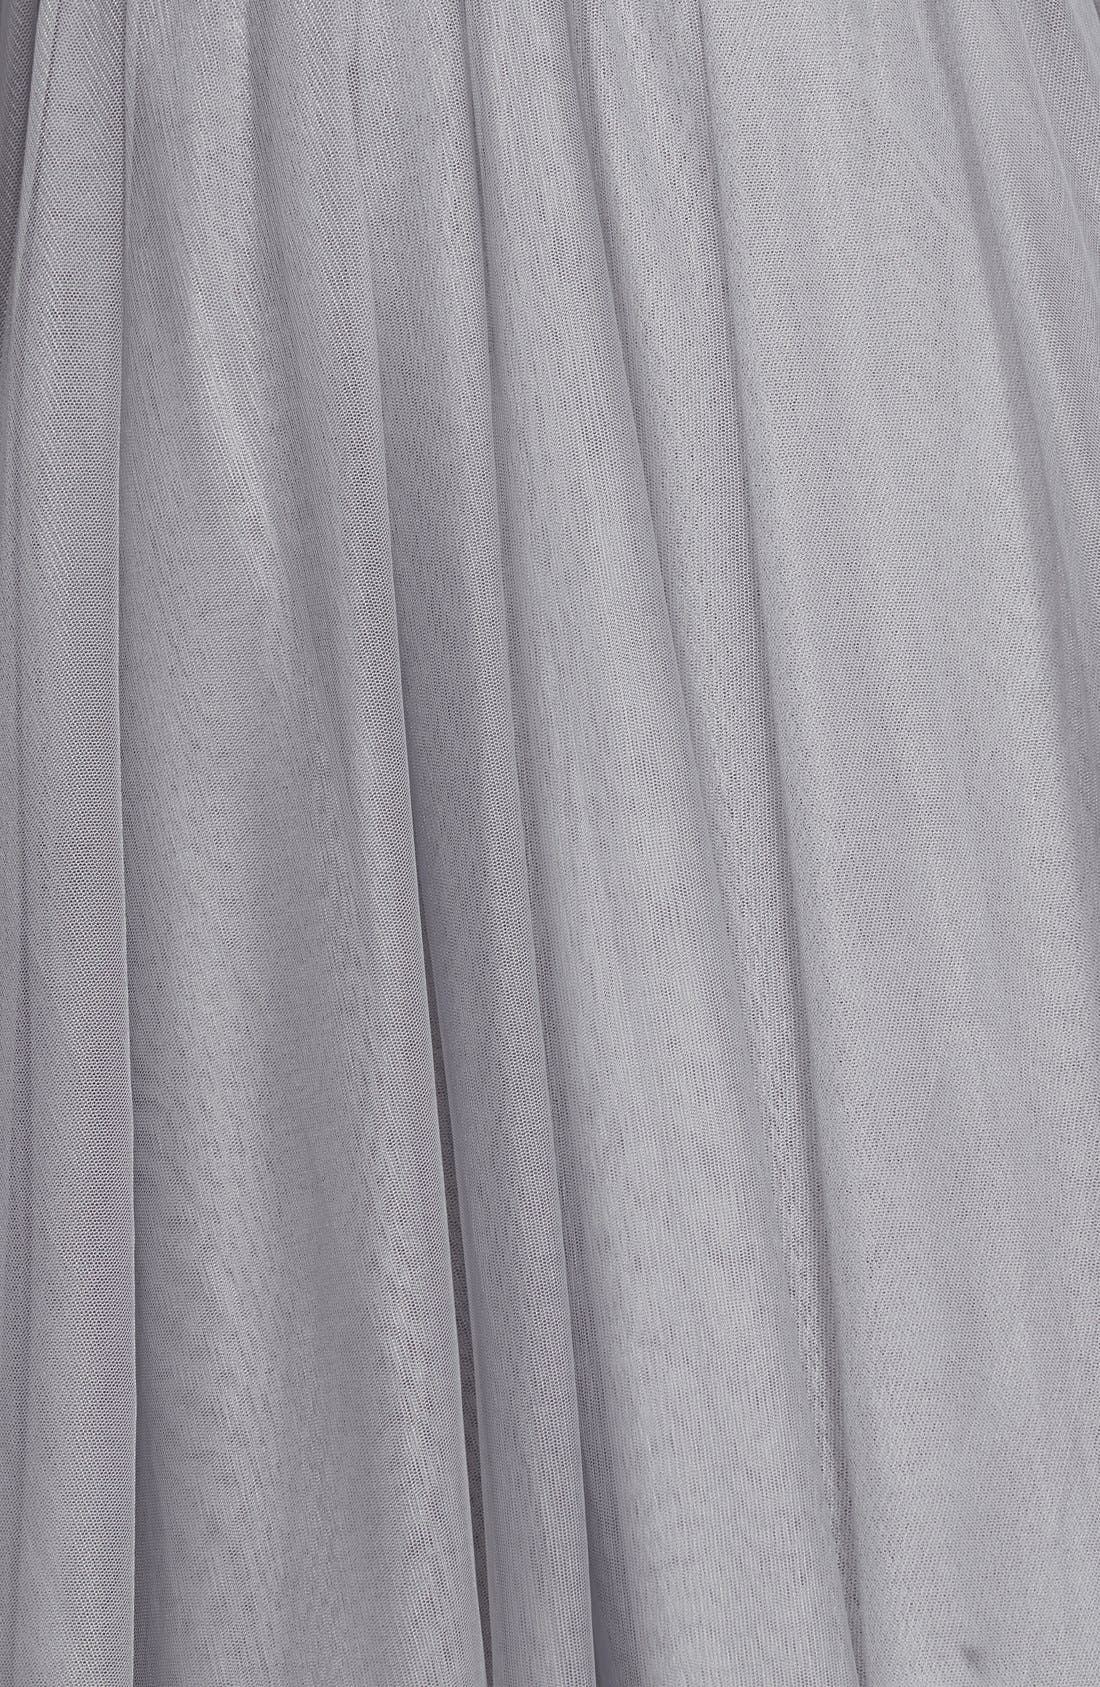 Alternate Image 3  - Bailey 44 'Shadow Waltz' Skirt